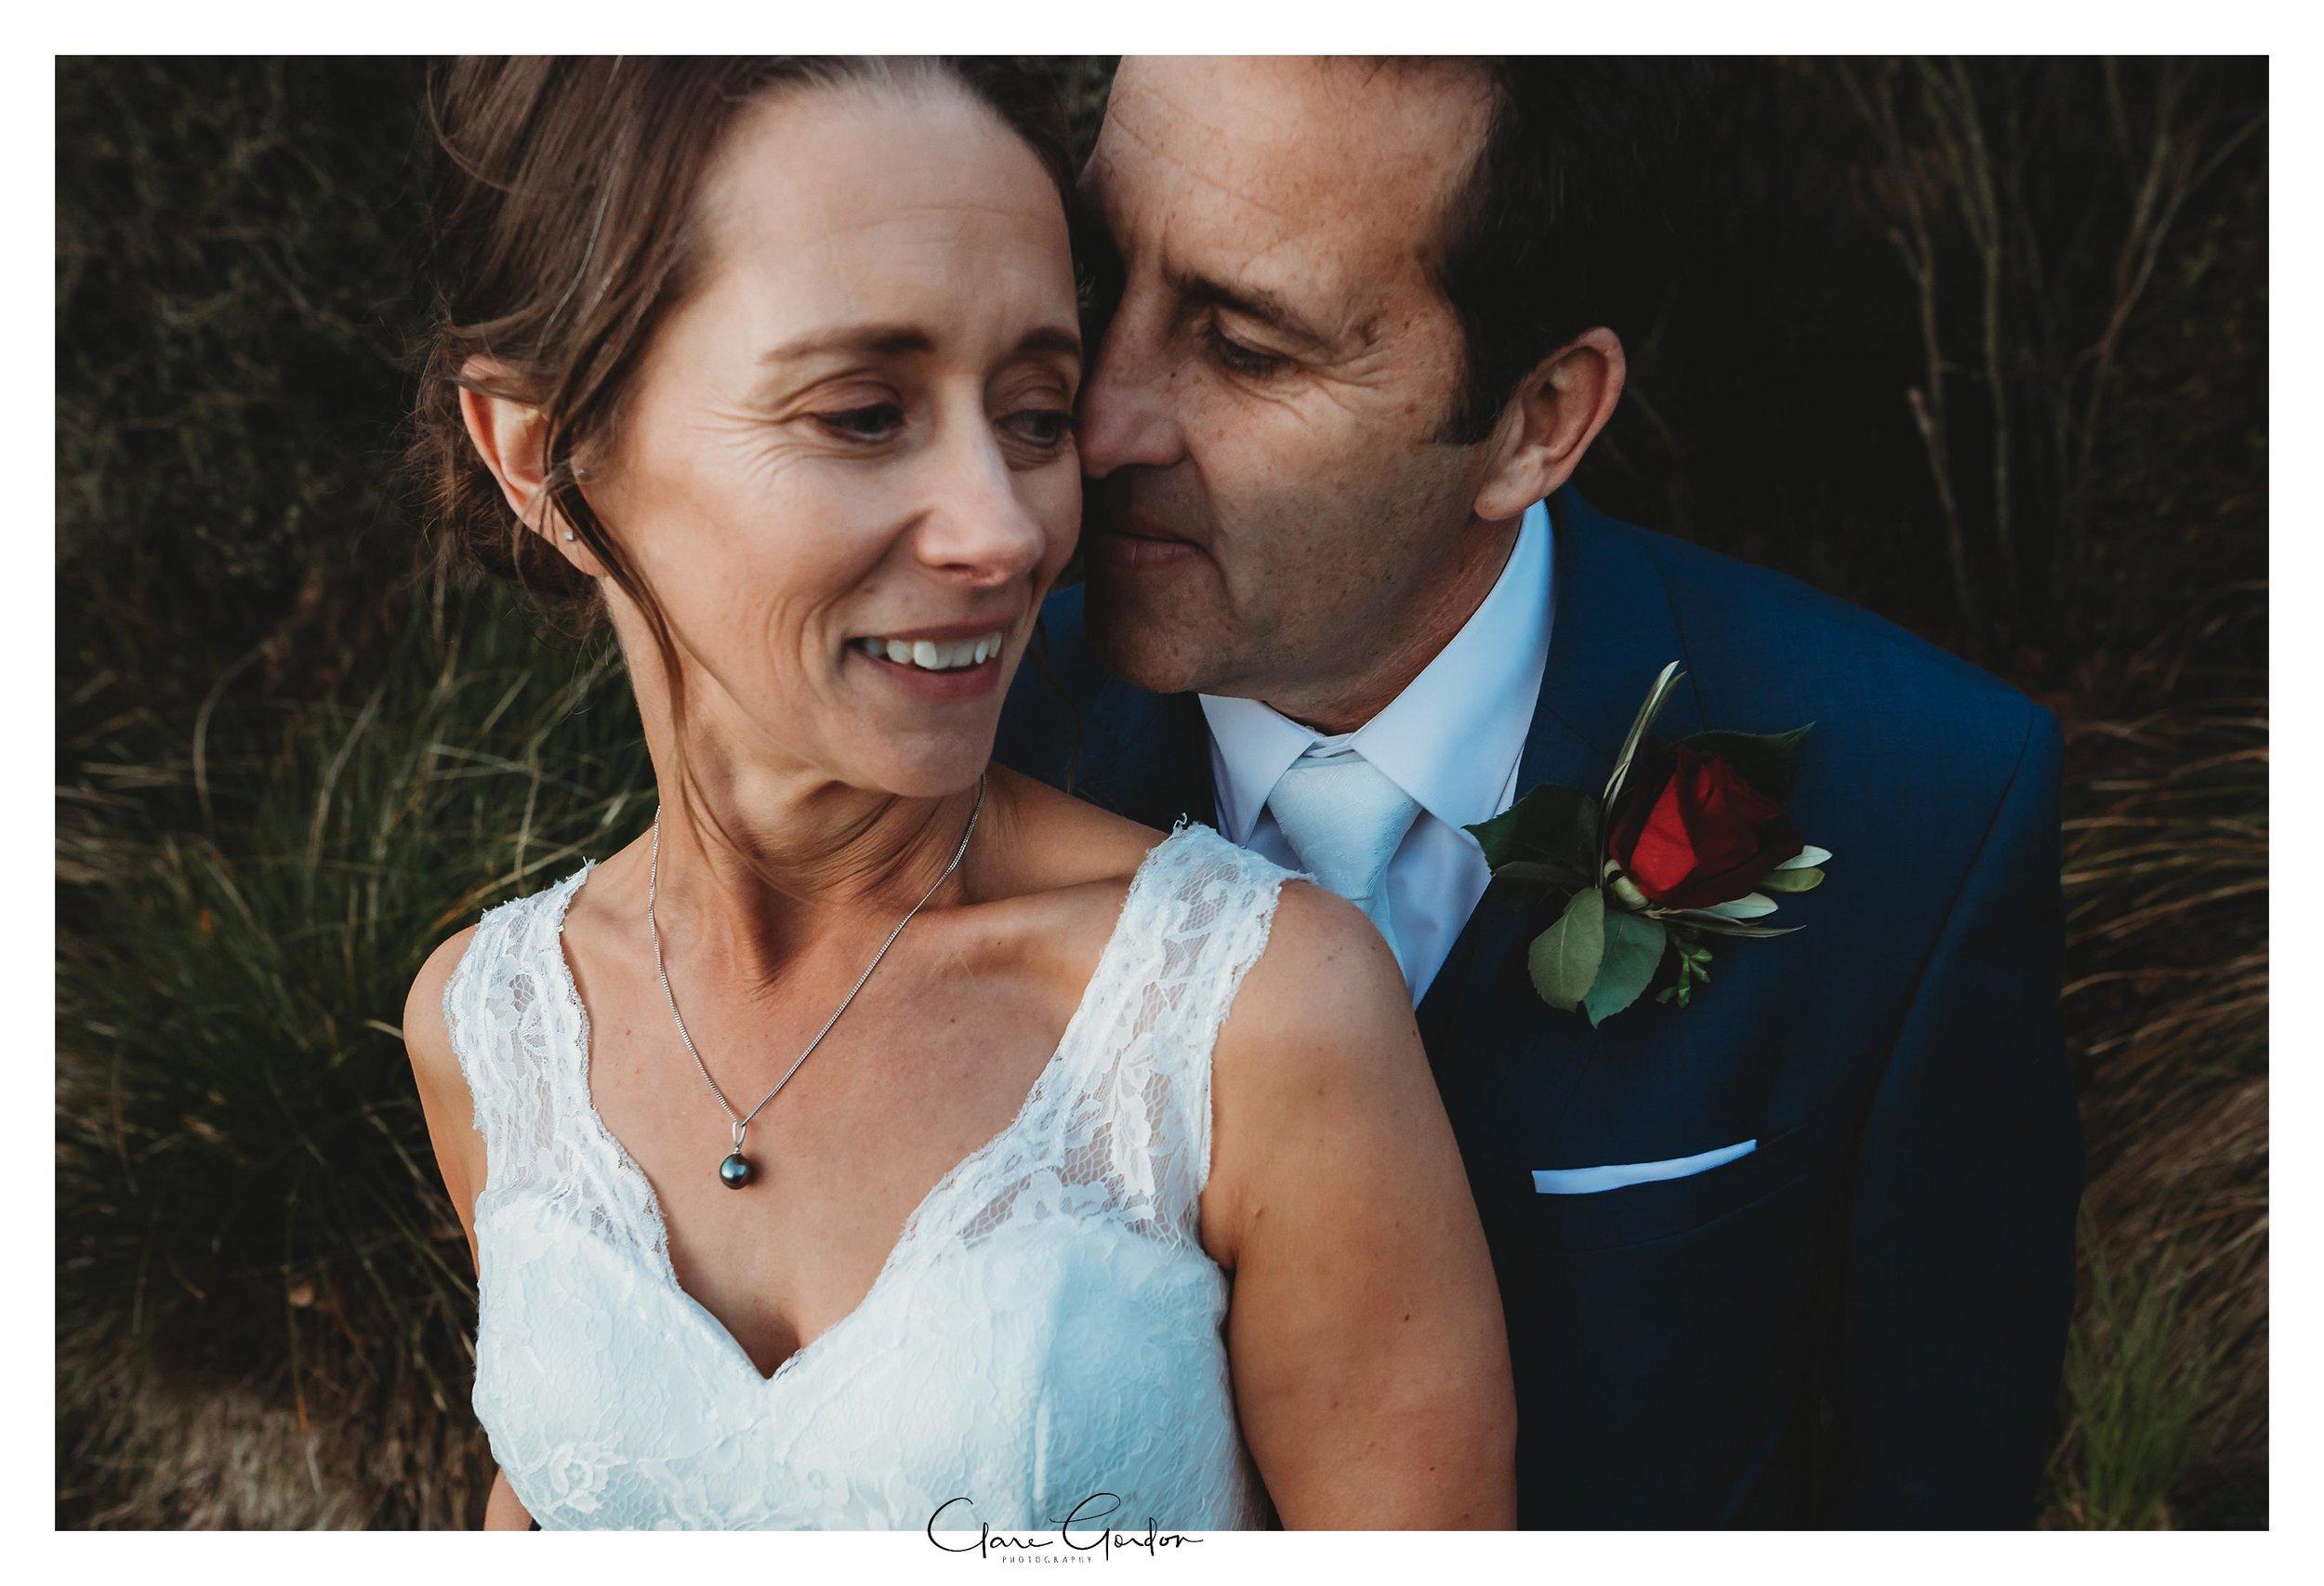 Hamilton-NZ-wedding-photographer-Bride-reflection-Waikato-wedding-photographer-Novotel-Hamilton-Clare-Gordon-photography (28).jpg